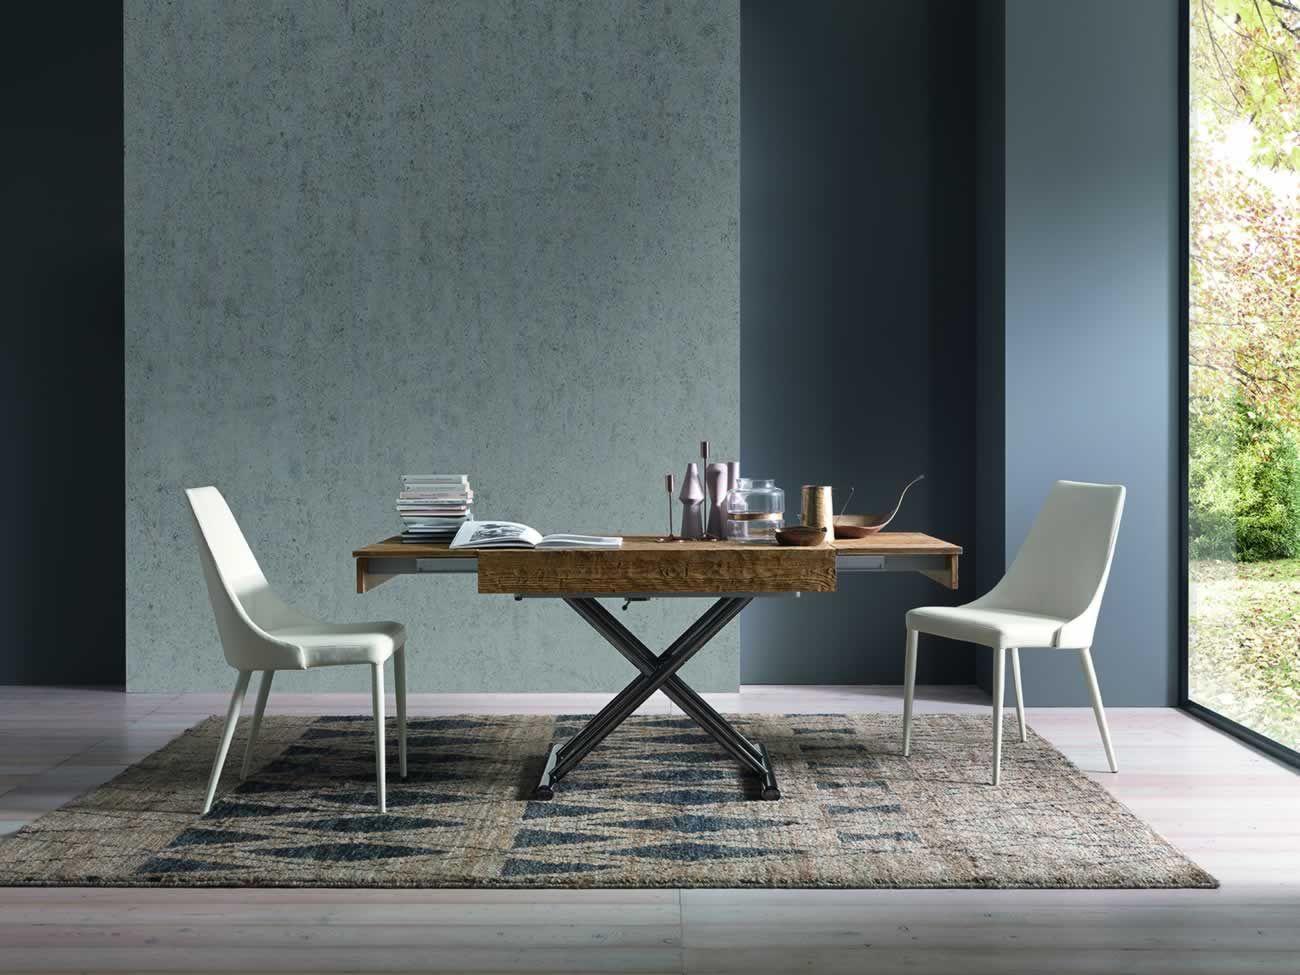 Tavolini trasformabili in tavoli da pranzo Tavoli da